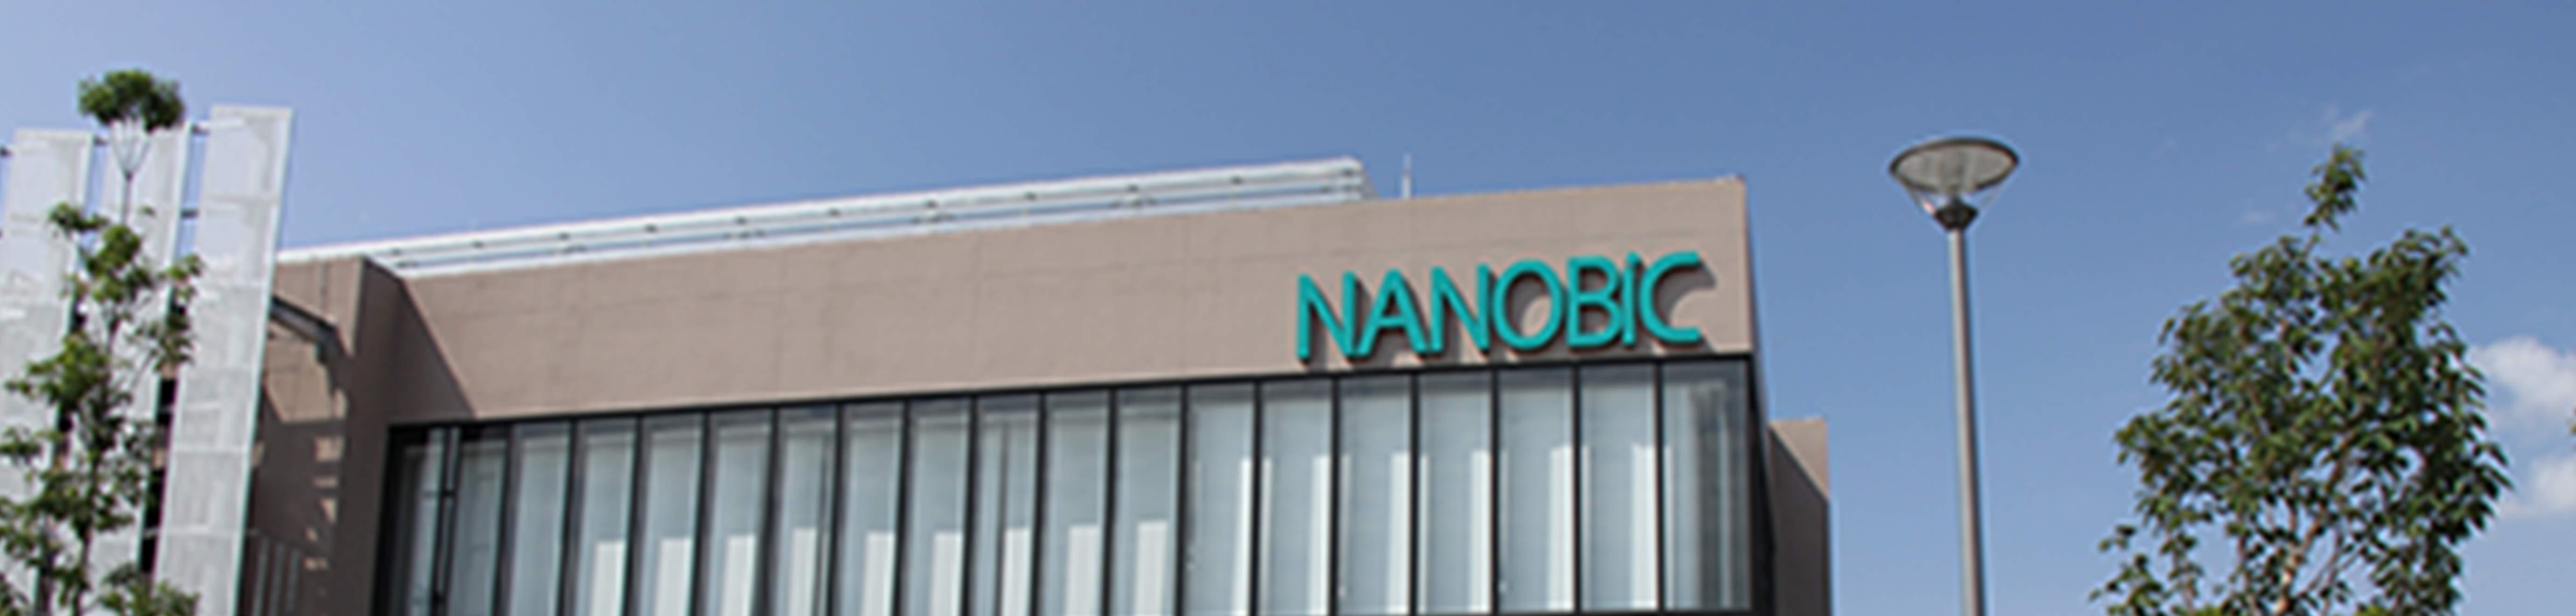 NANOBIC事業概要ページを表す画像